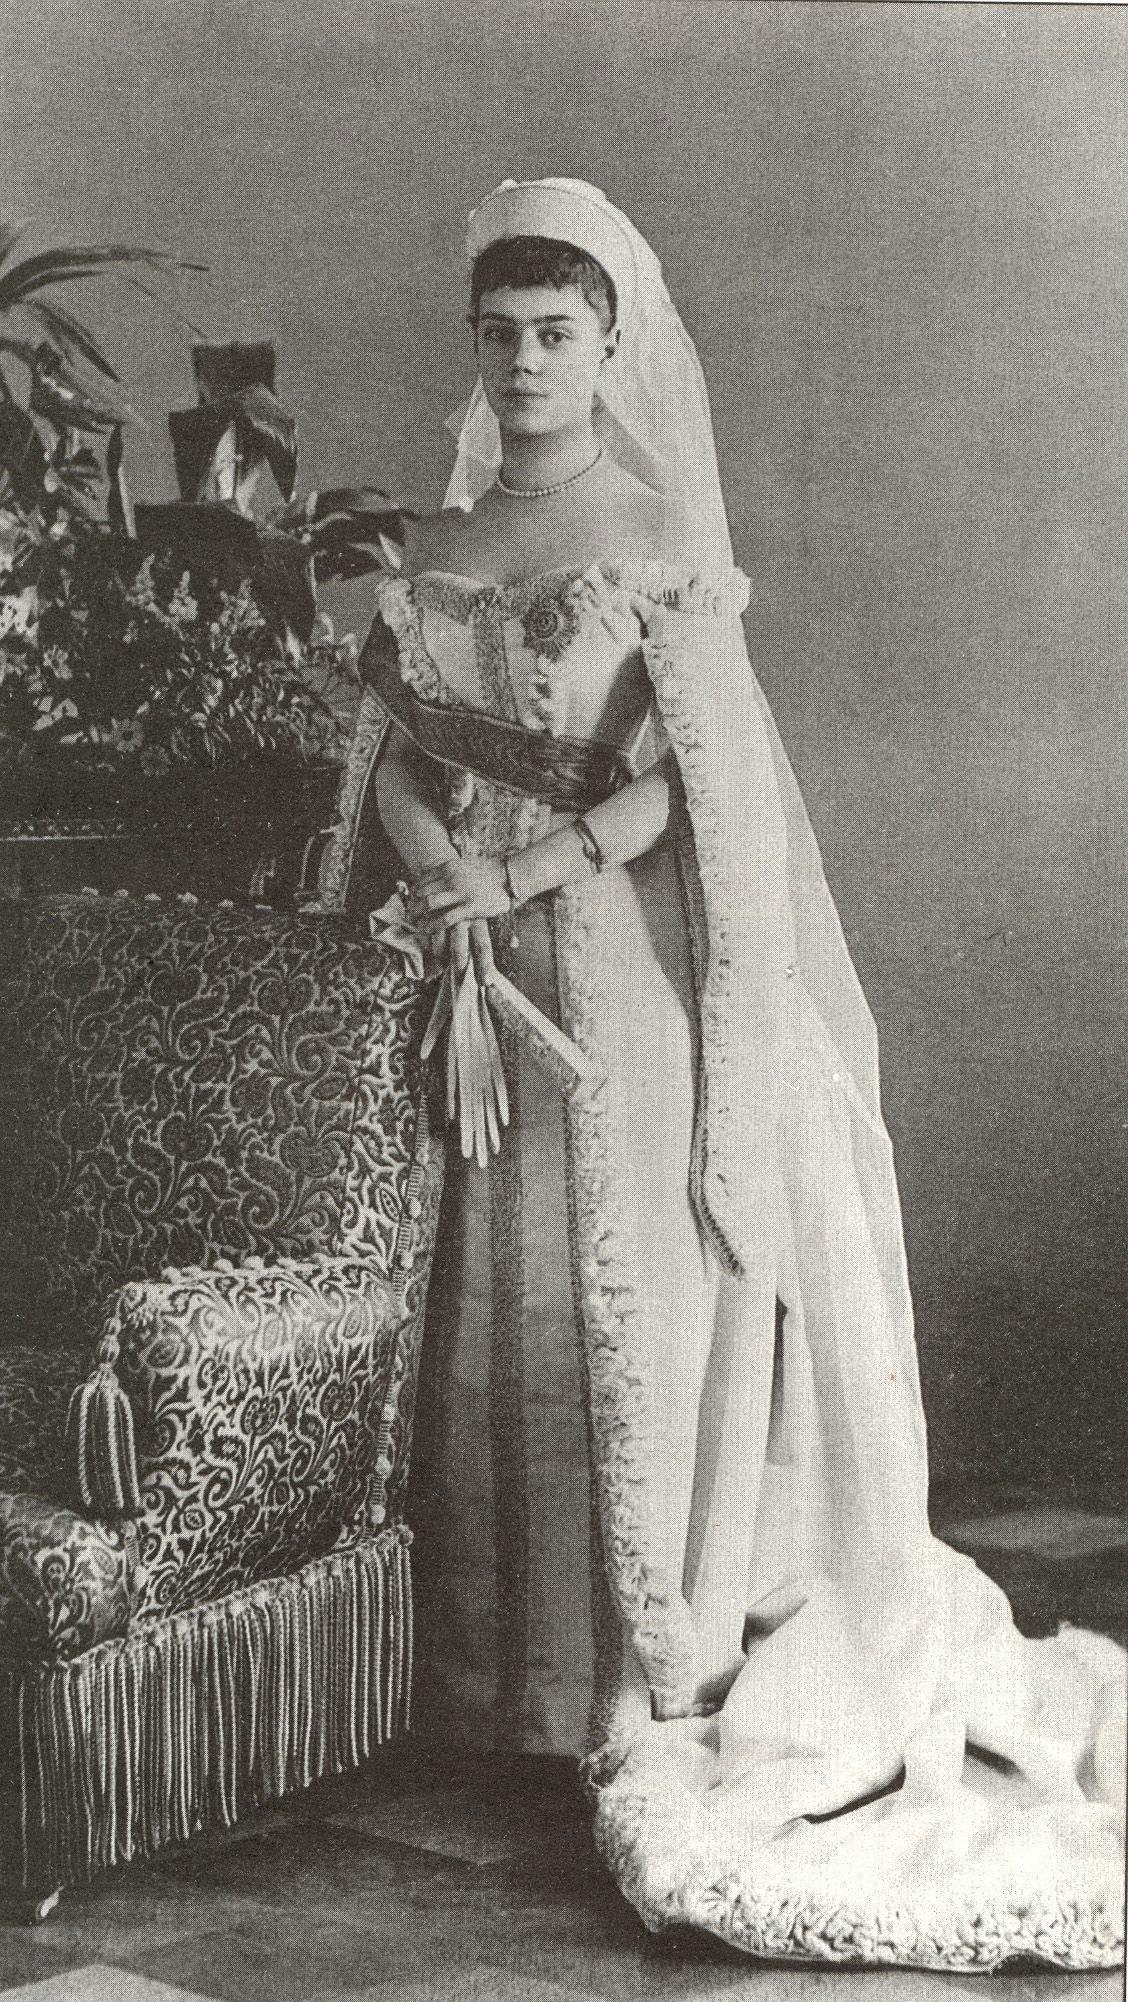 https://upload.wikimedia.org/wikipedia/commons/7/70/Xenia_Alexandrovna_of_Russia.jpg